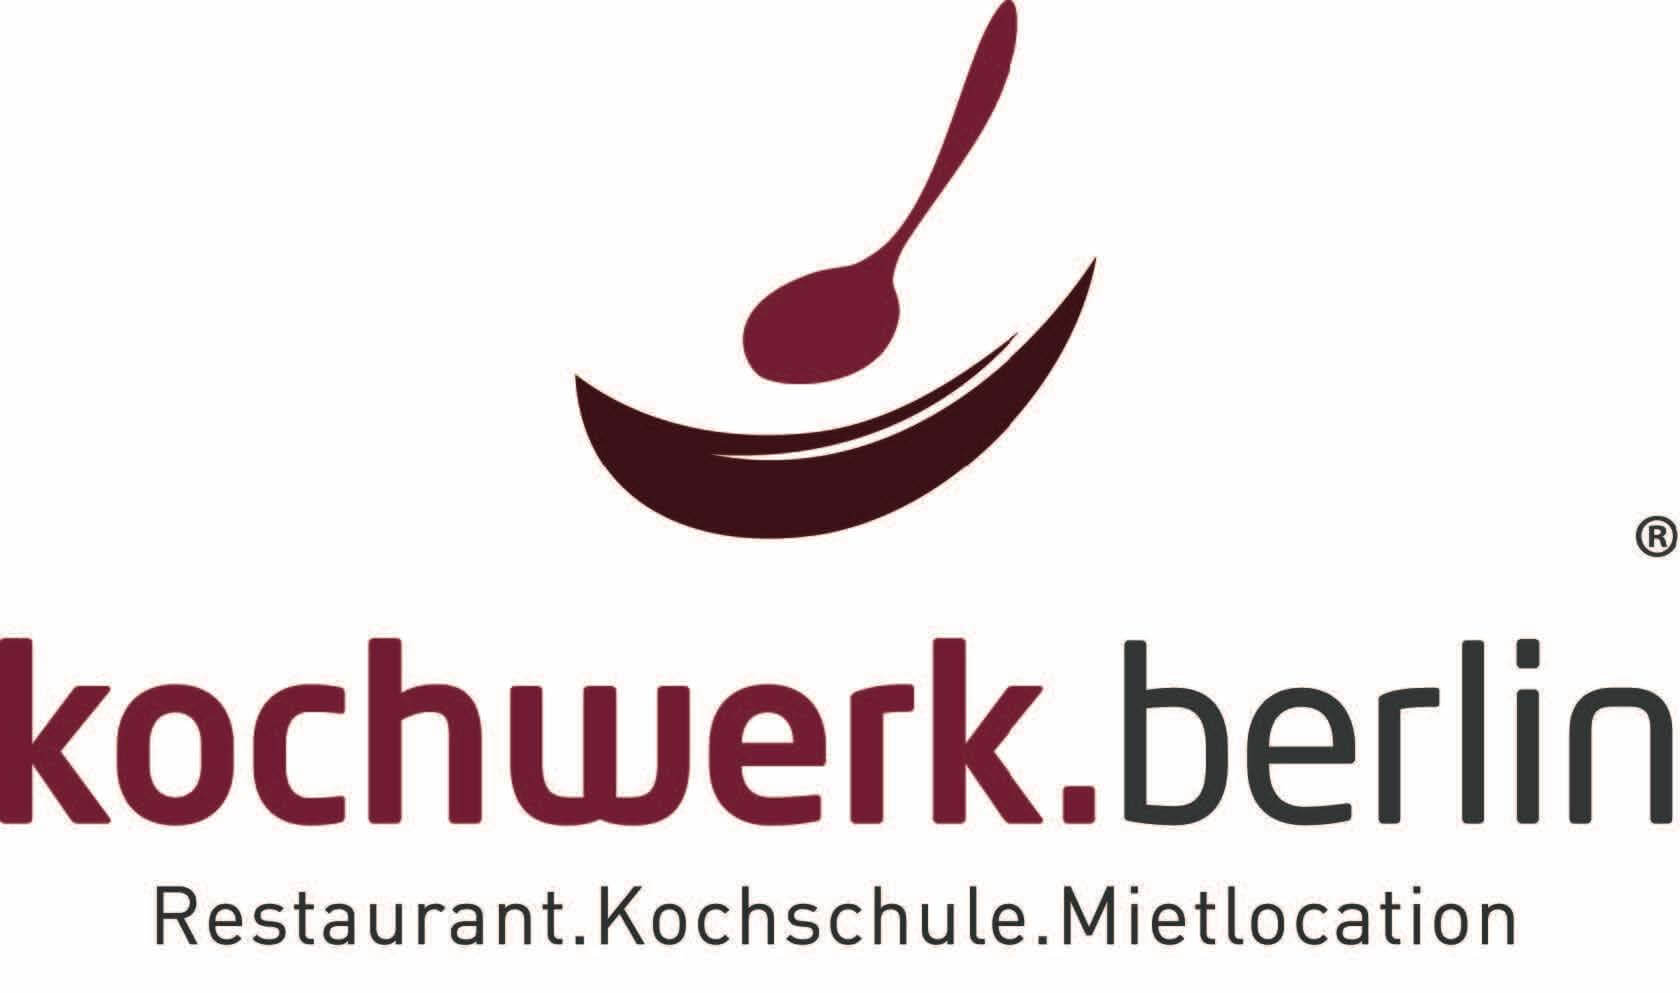 Kochwerk.Berlin - Restaurant. Kochschule. Mietlocation